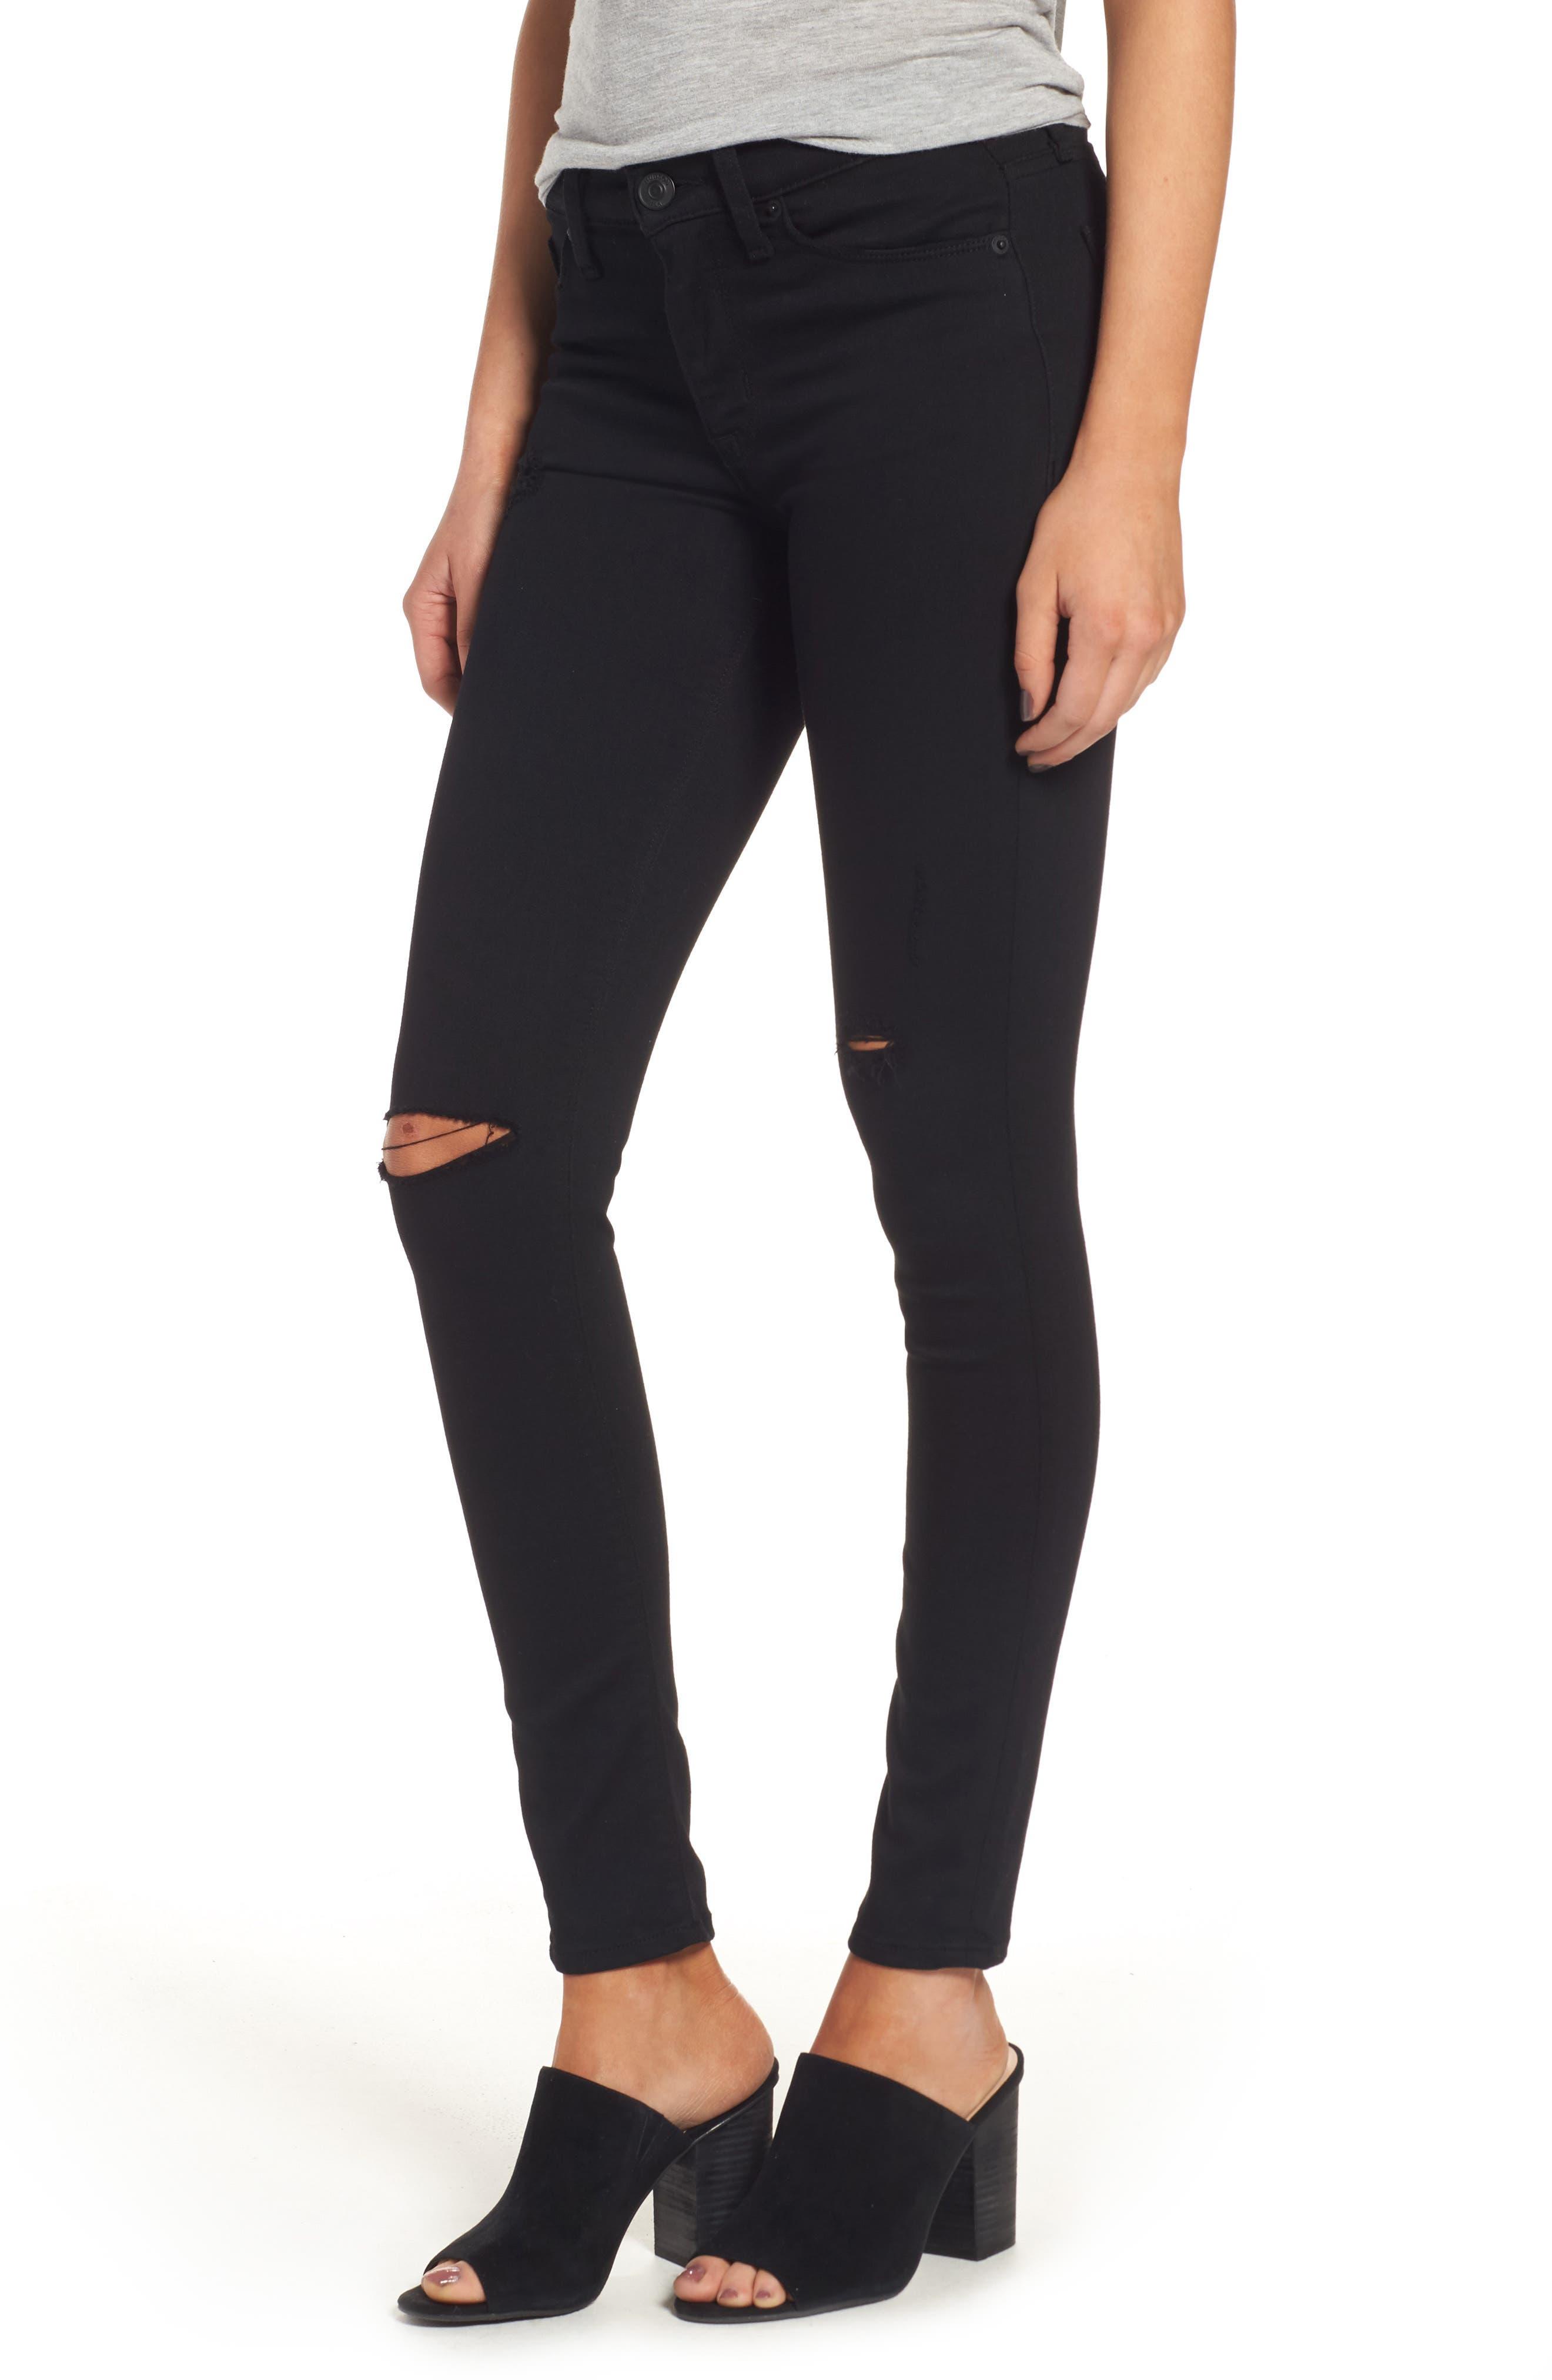 Main Image - Hudson Jeans 'Elysian - Nico' Super Skinny Jeans (Destructed Black) (Nordstrom Exclusive)